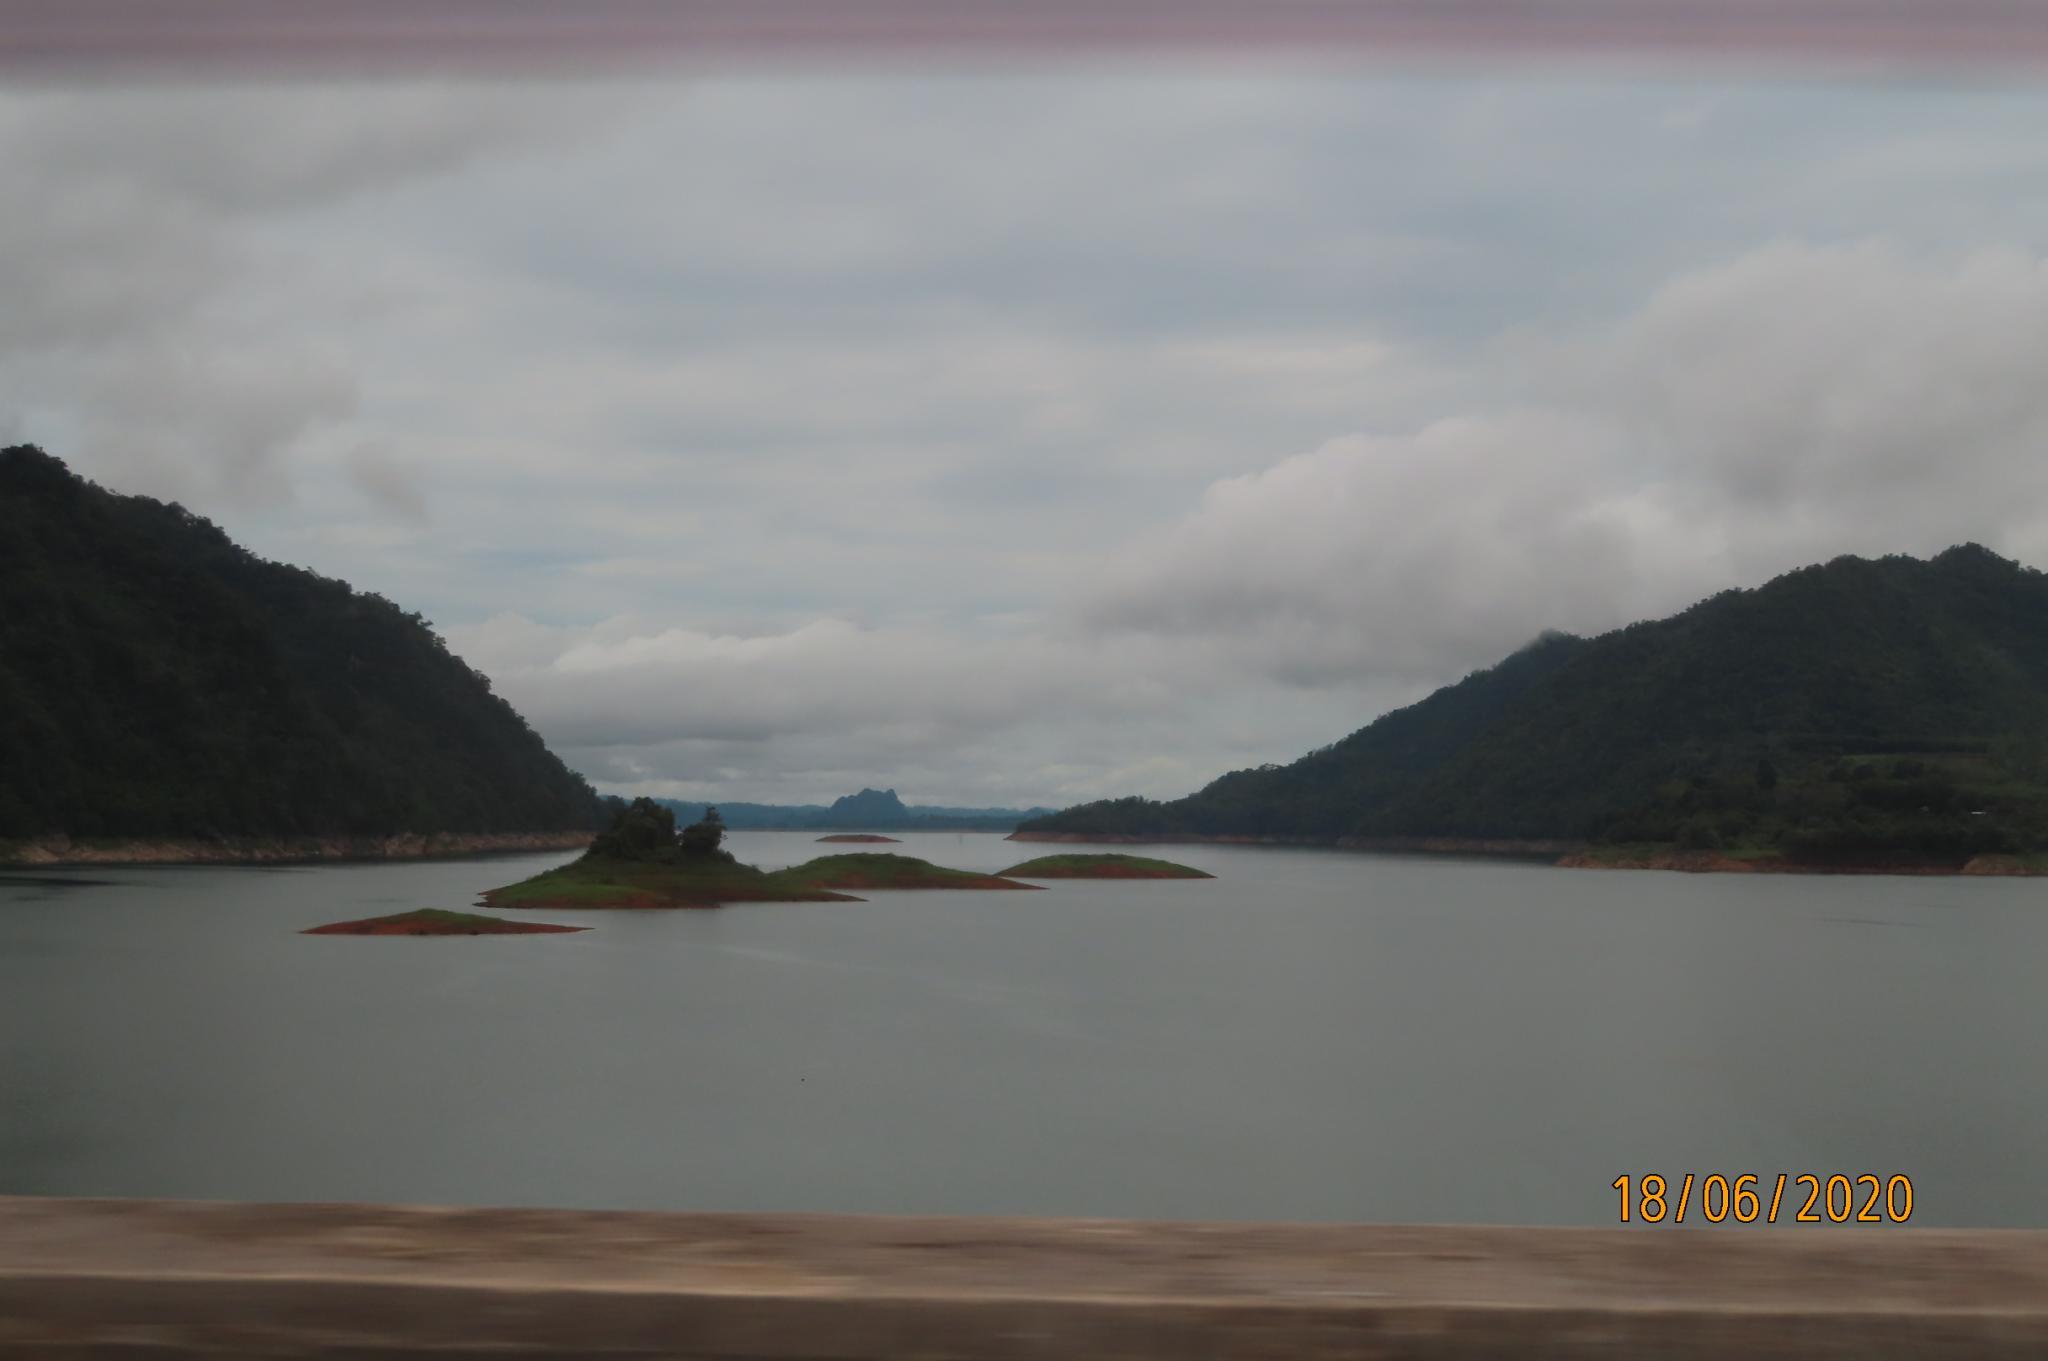 Vajiralongkorn (Rama X) Dam and Hydro Electric Power Plant-img_6594-jpg